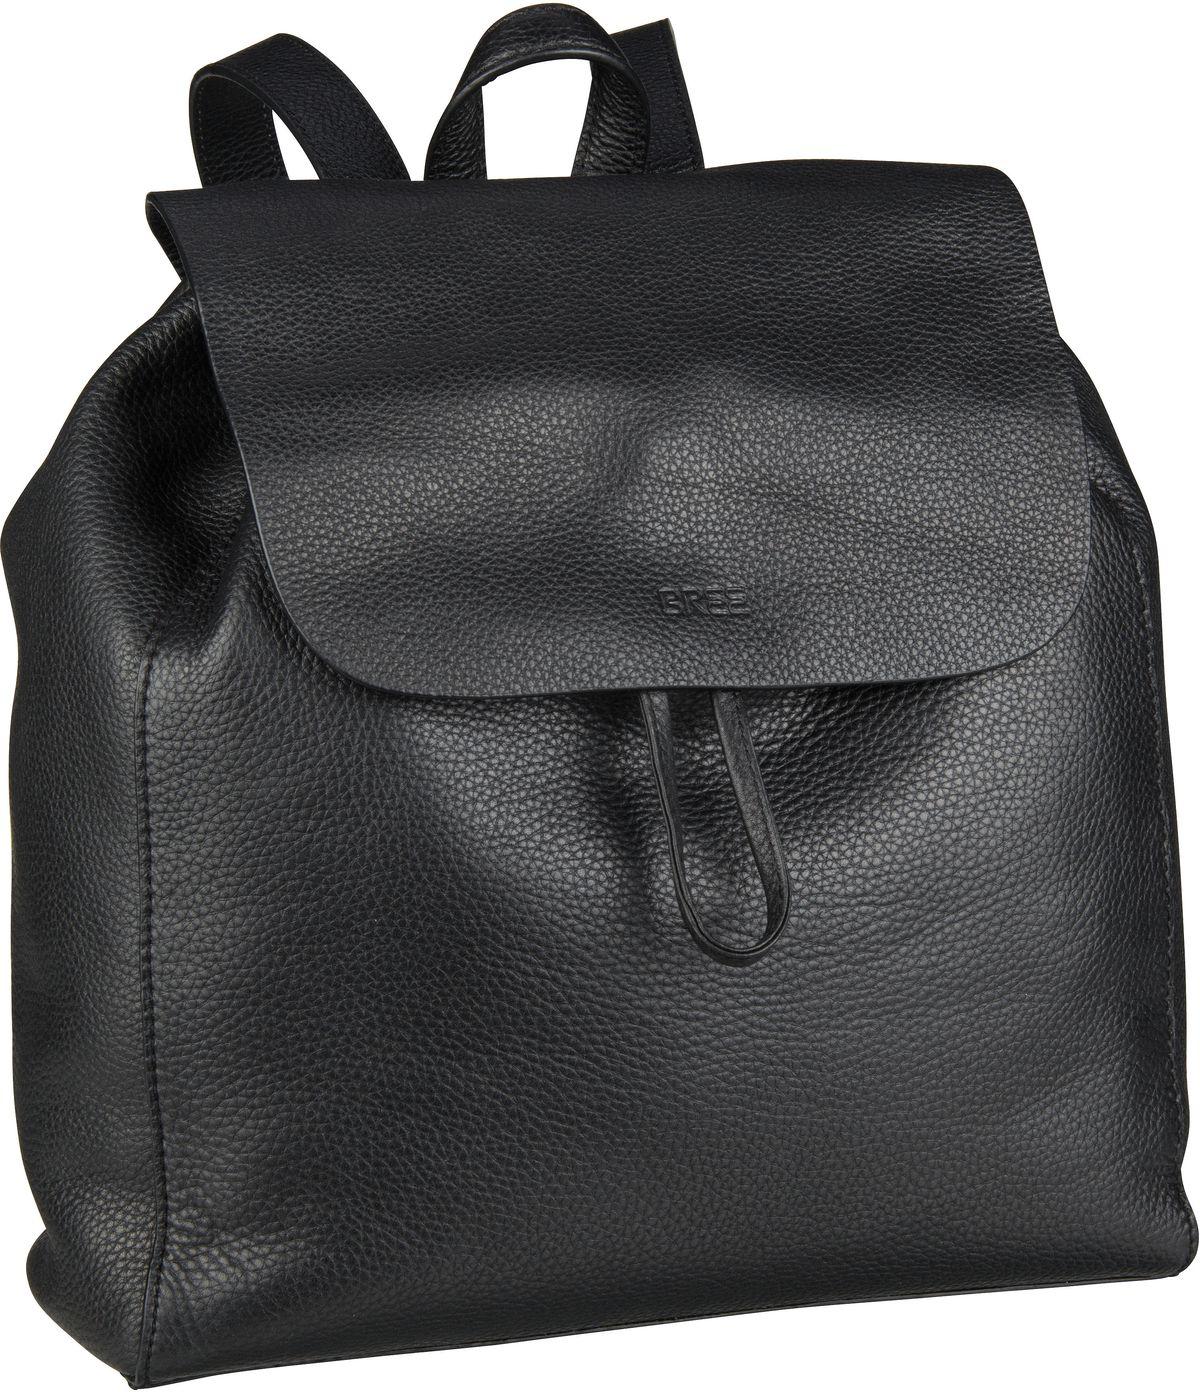 Rucksack / Daypack Justine 3 Black (11 Liter)